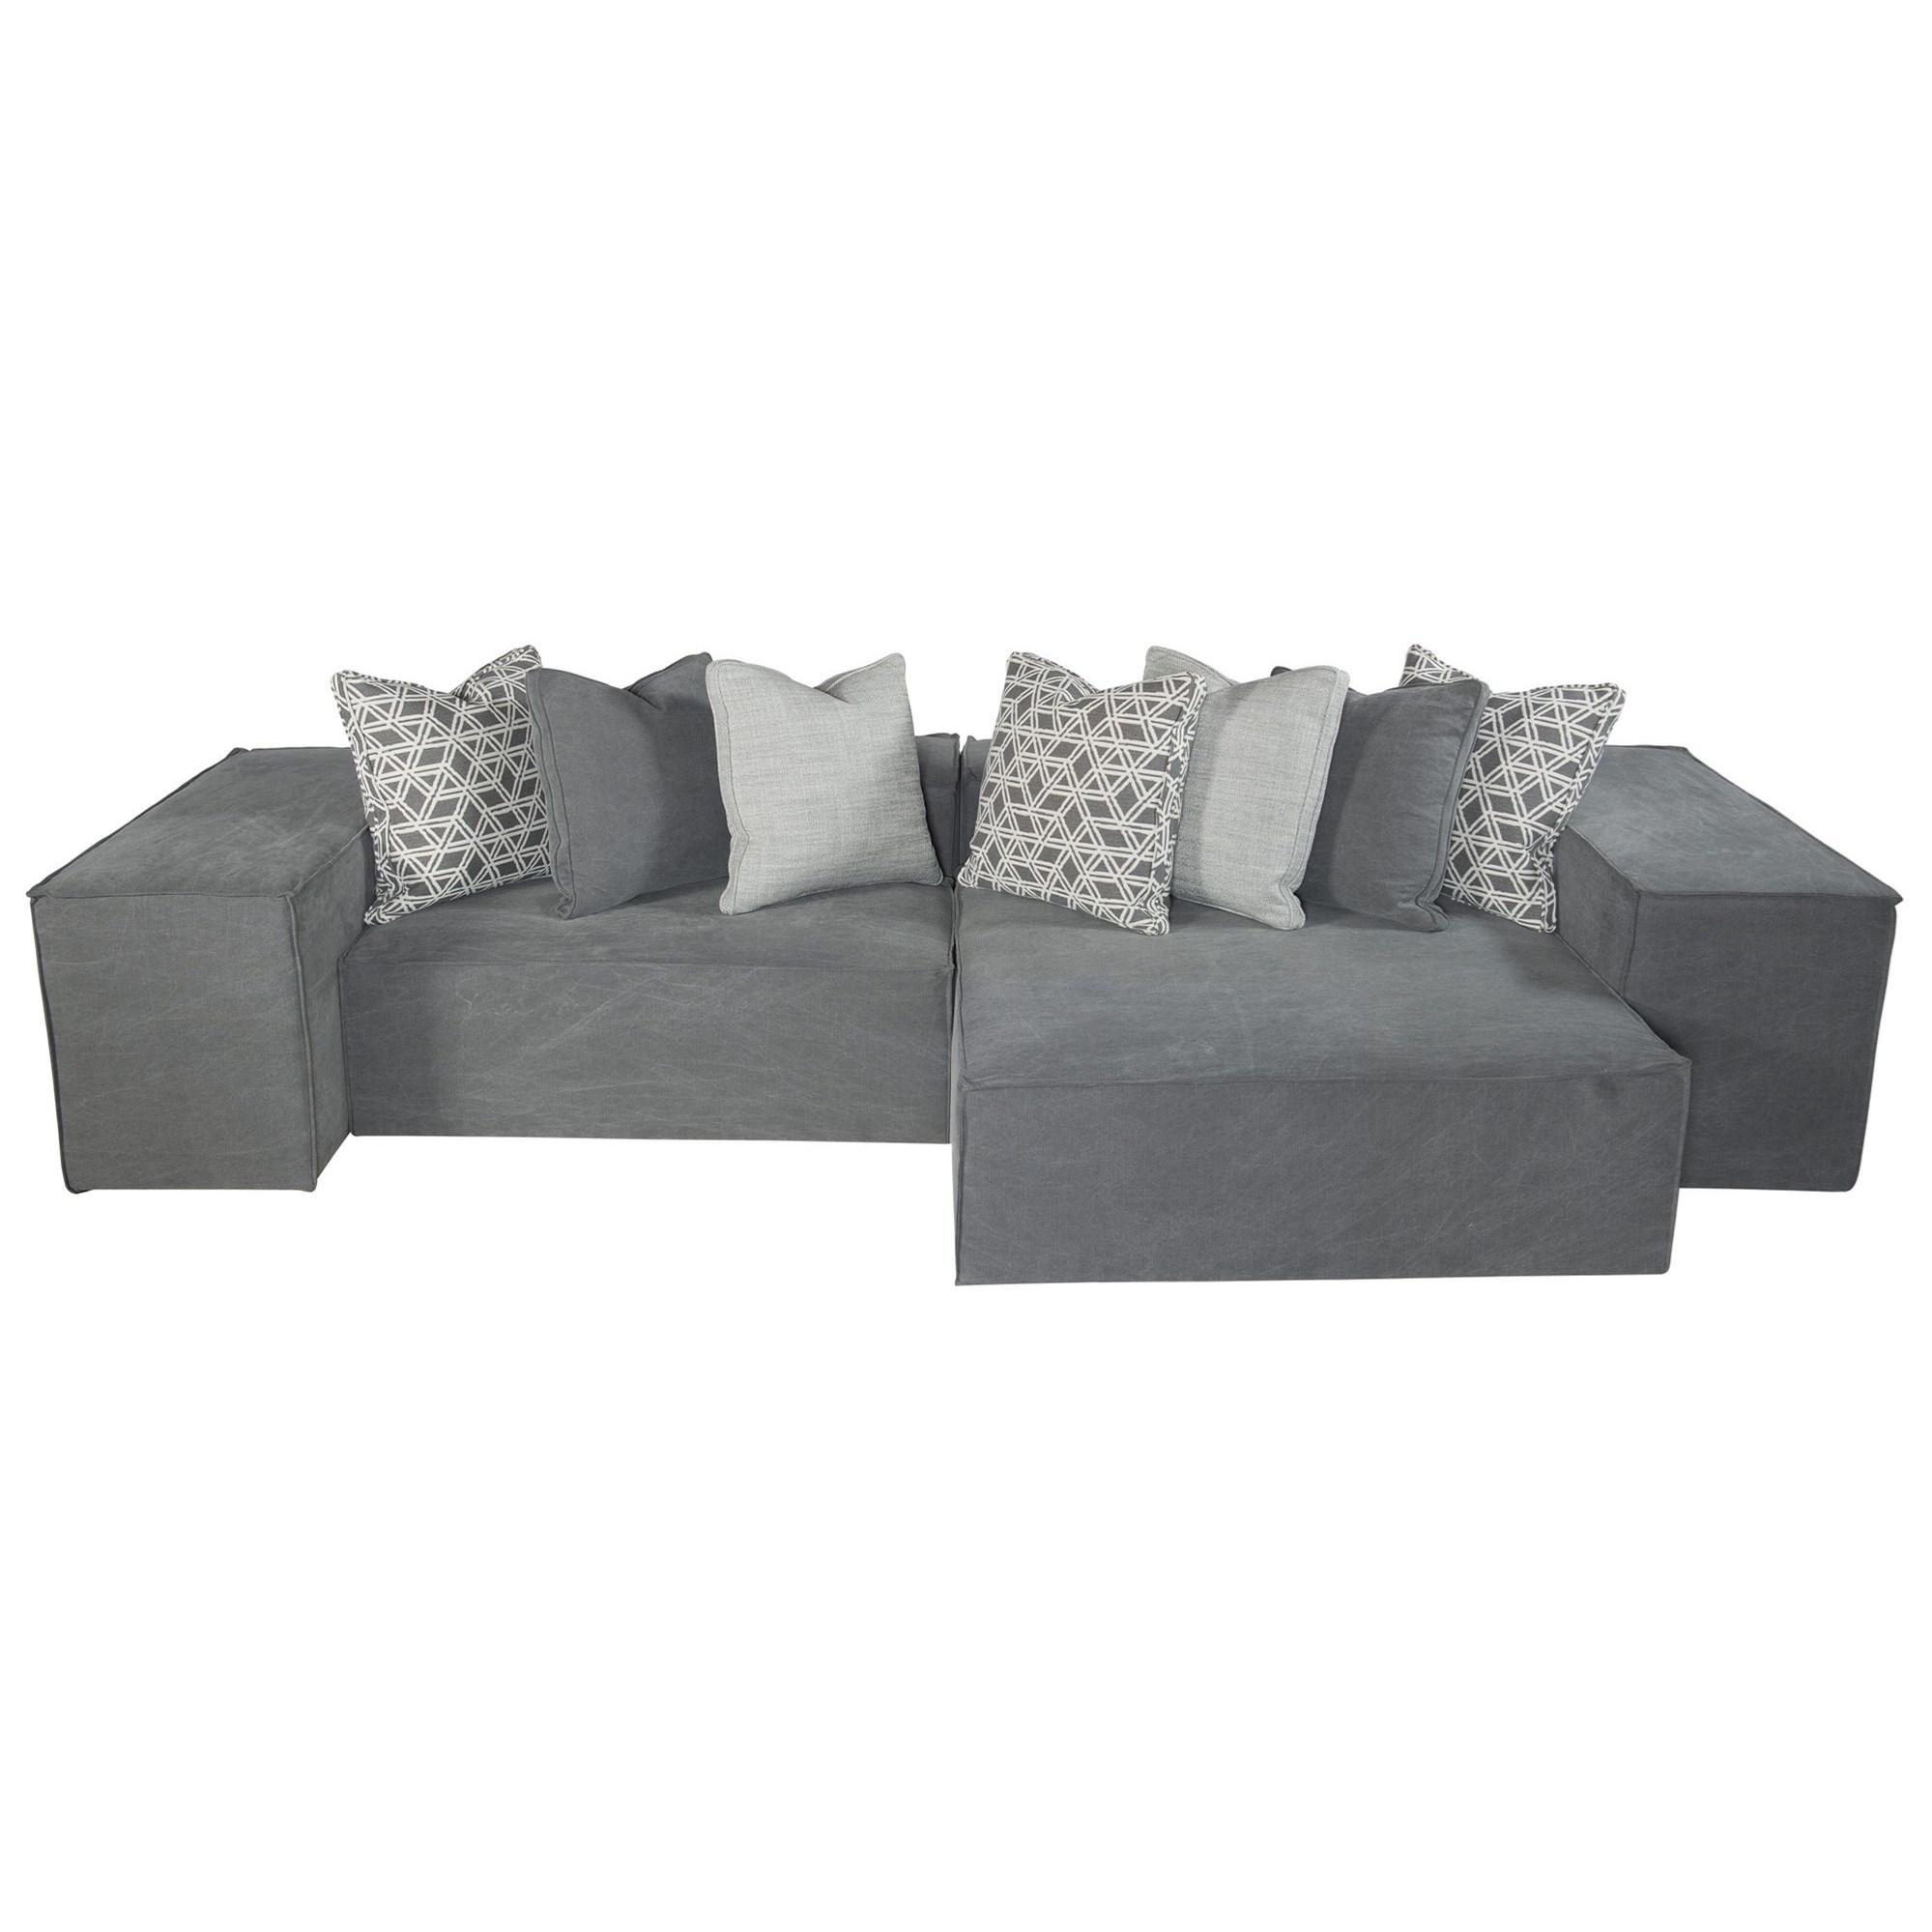 Interiors - Format Sectional Sofa (6-piece) at Williams & Kay